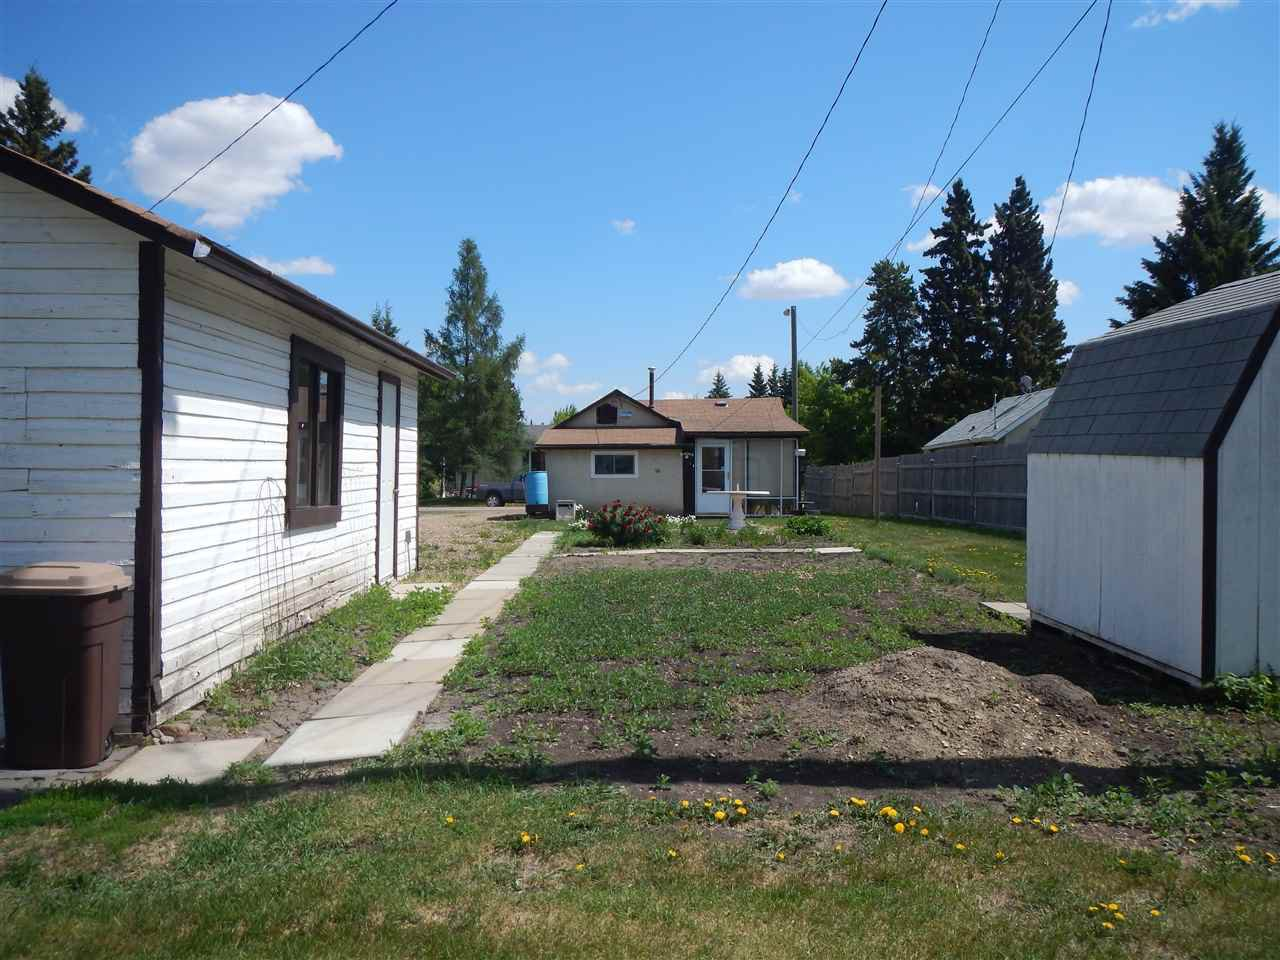 Photo 4: Photos: 5120 48 Street: Waskatenau House for sale : MLS®# E4201146